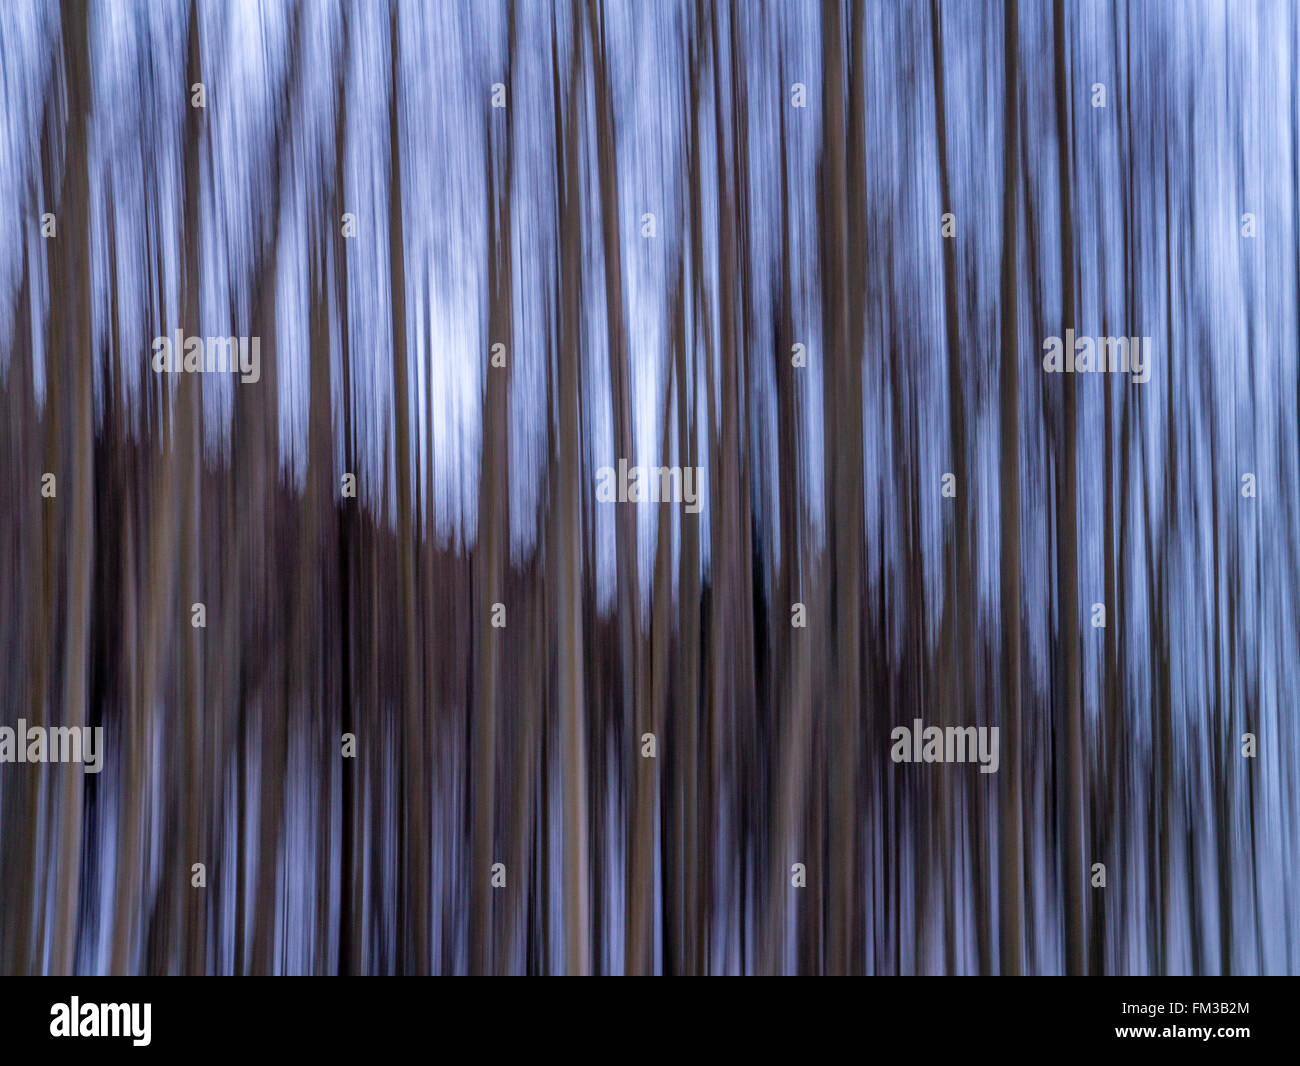 Landscape orientation  of stripes, blues and greys - Stock Image